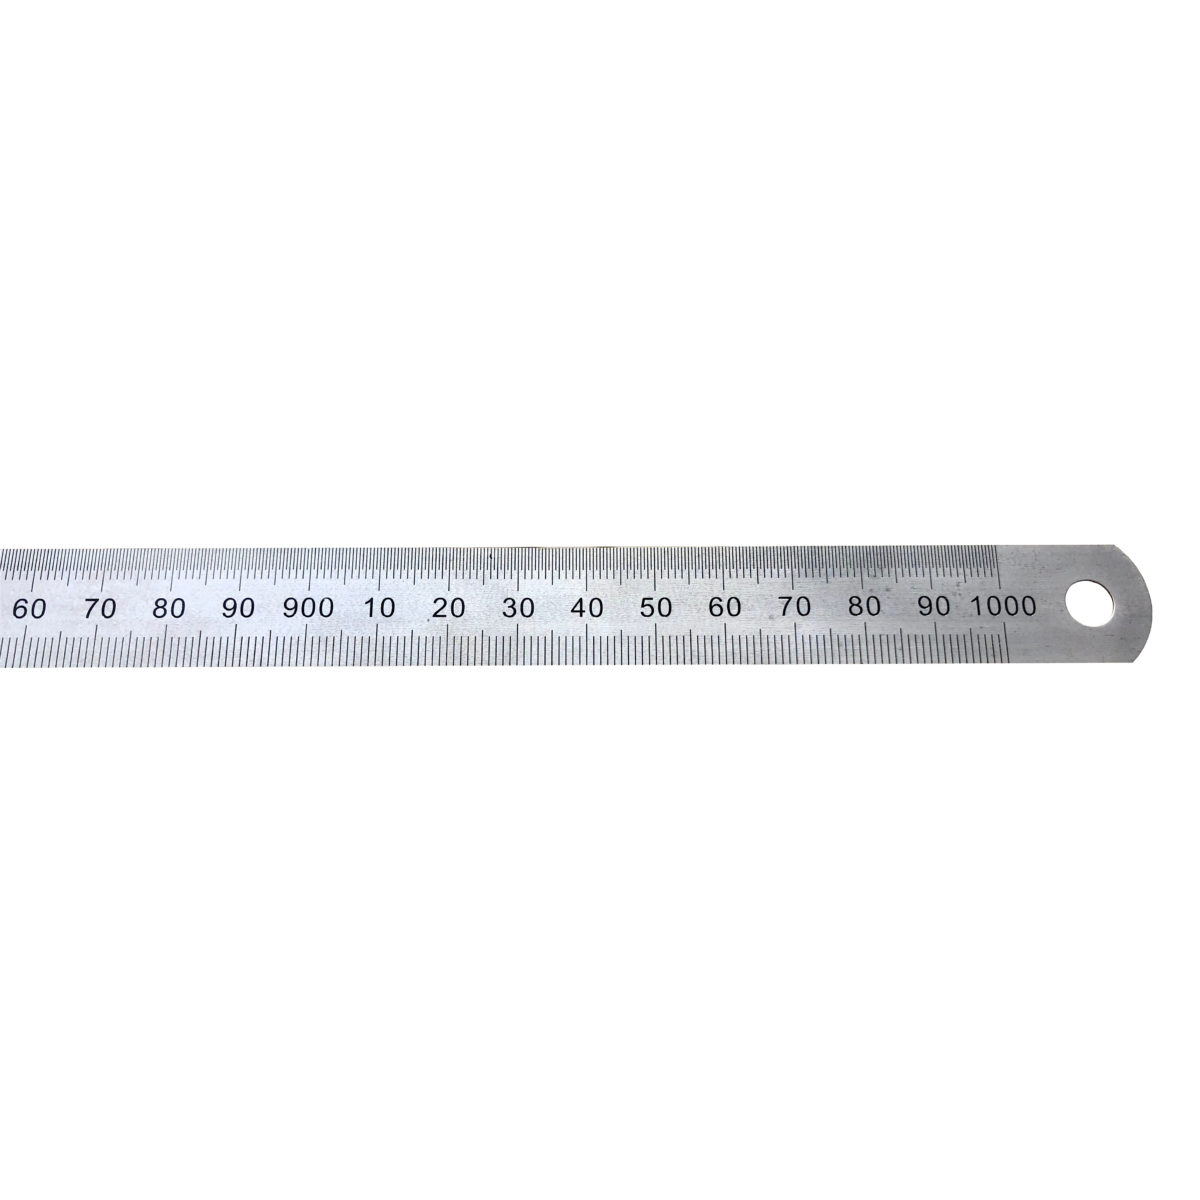 gm Stahlmaßstab 1000 mm in Draufsicht